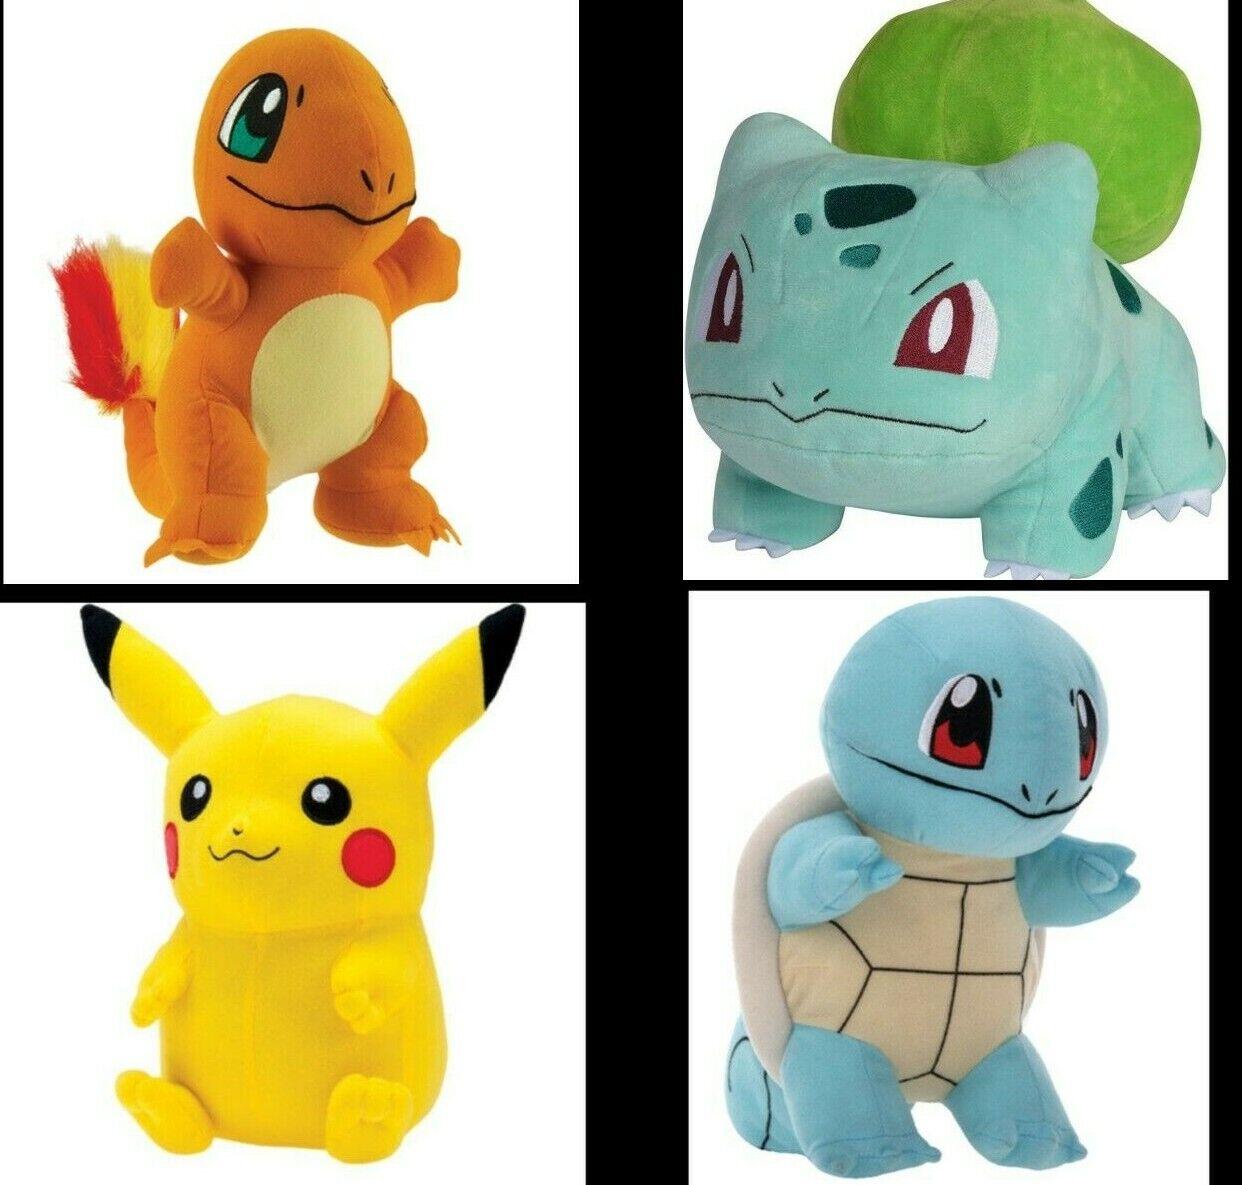 "как выглядит Pokemon Pikachu Bulbasaur Charmander Squirtle Plush doll 6"" Stuff Animal Figure фото"